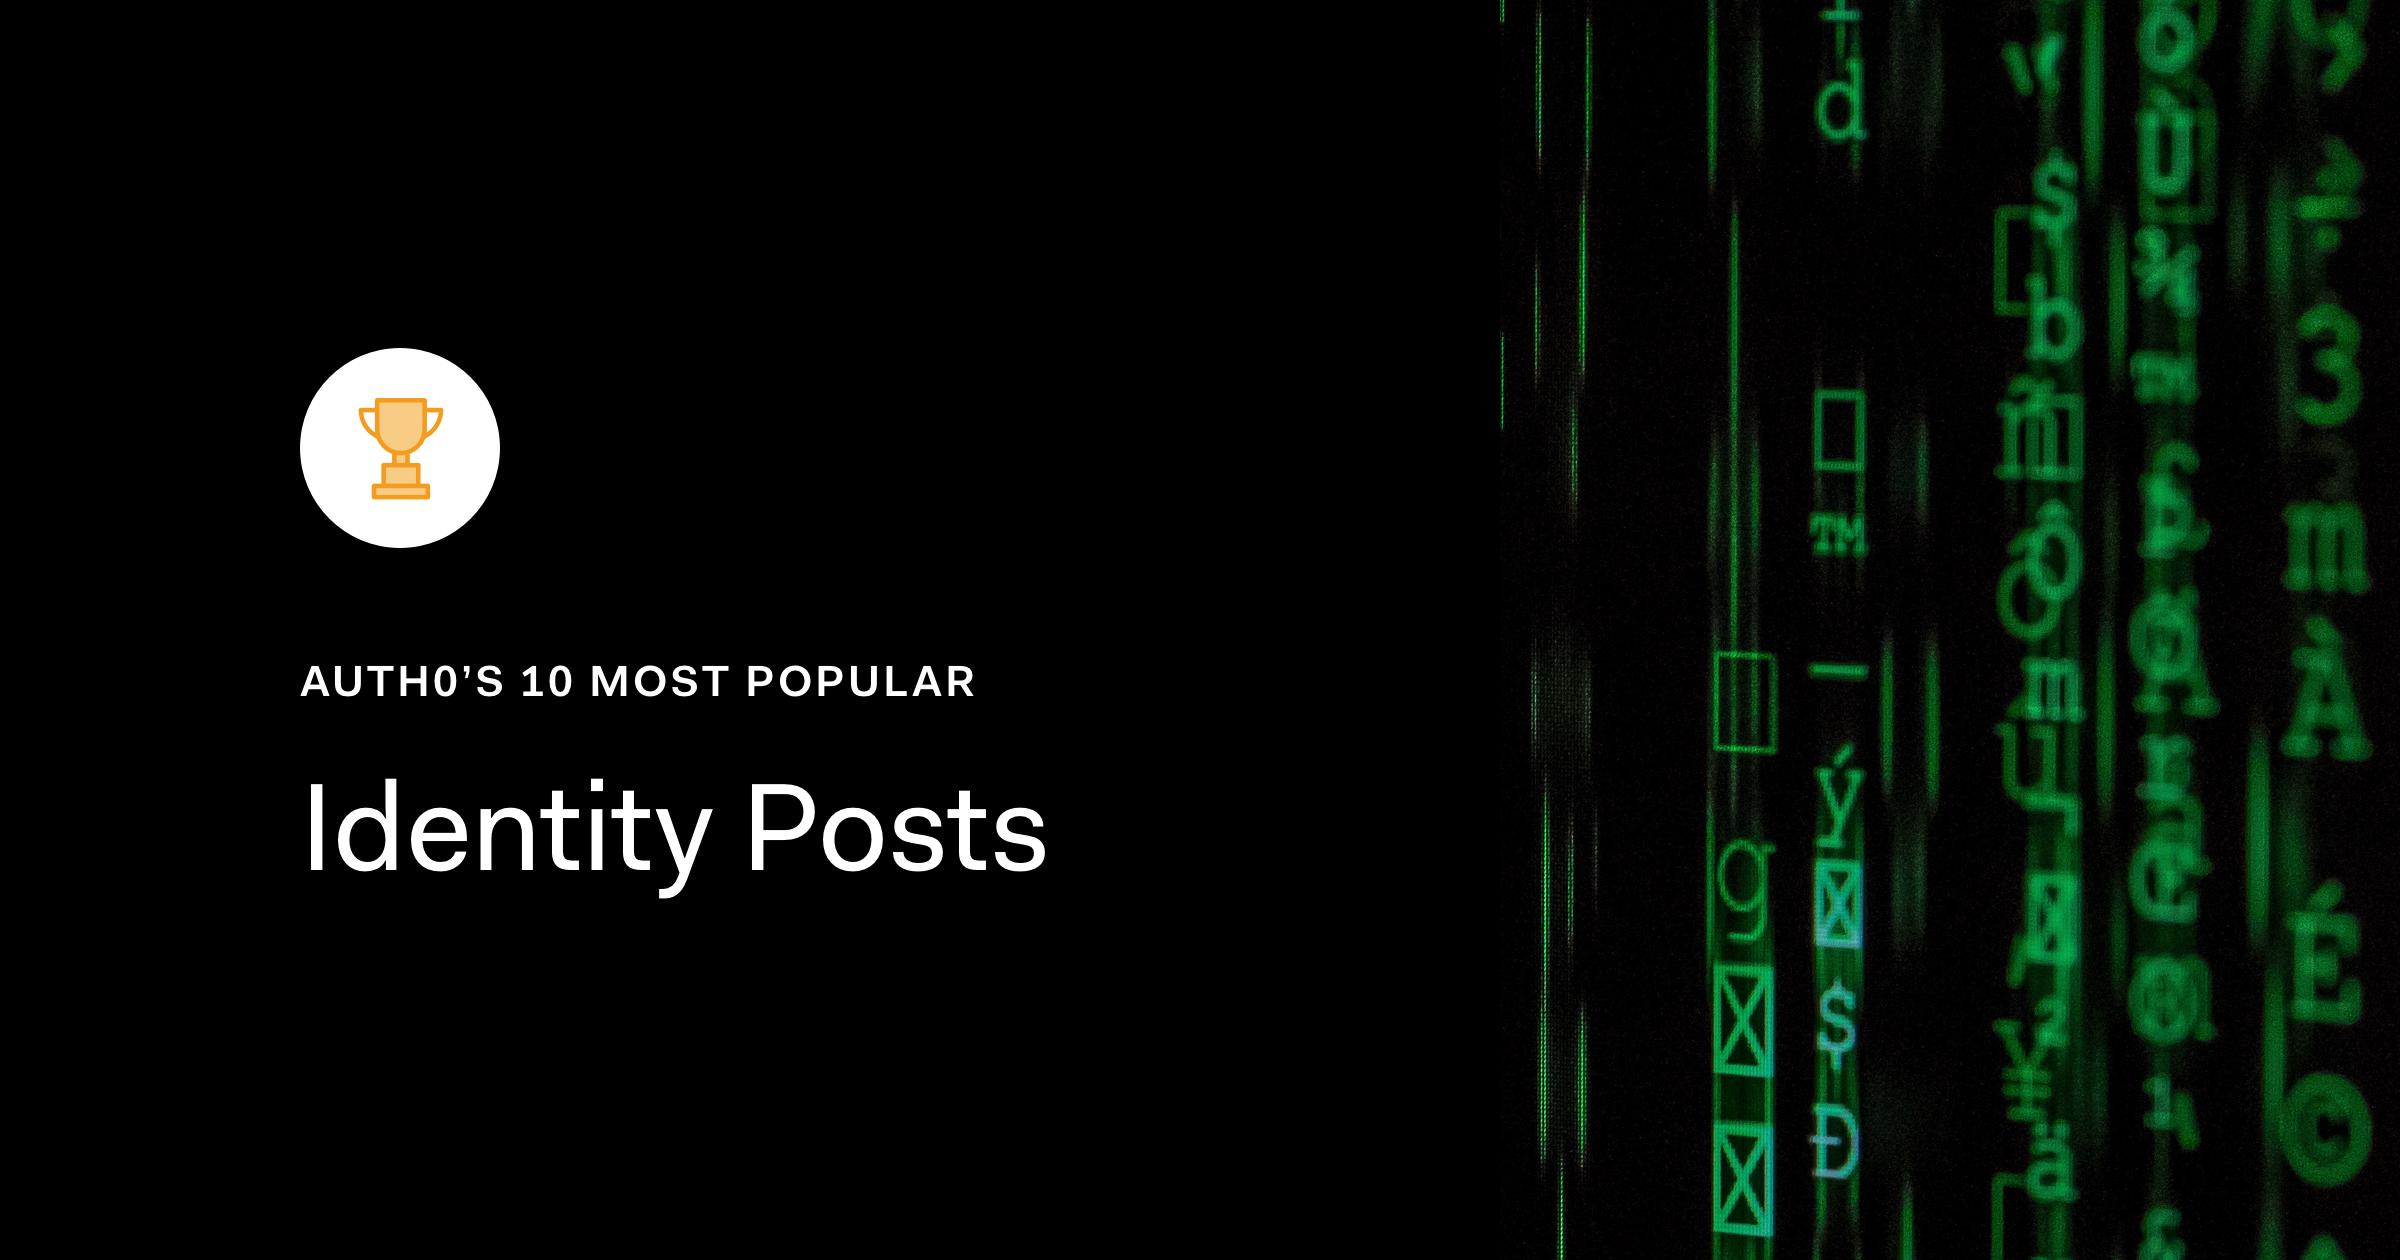 Auth0's 10 Most-Popular Identity Posts